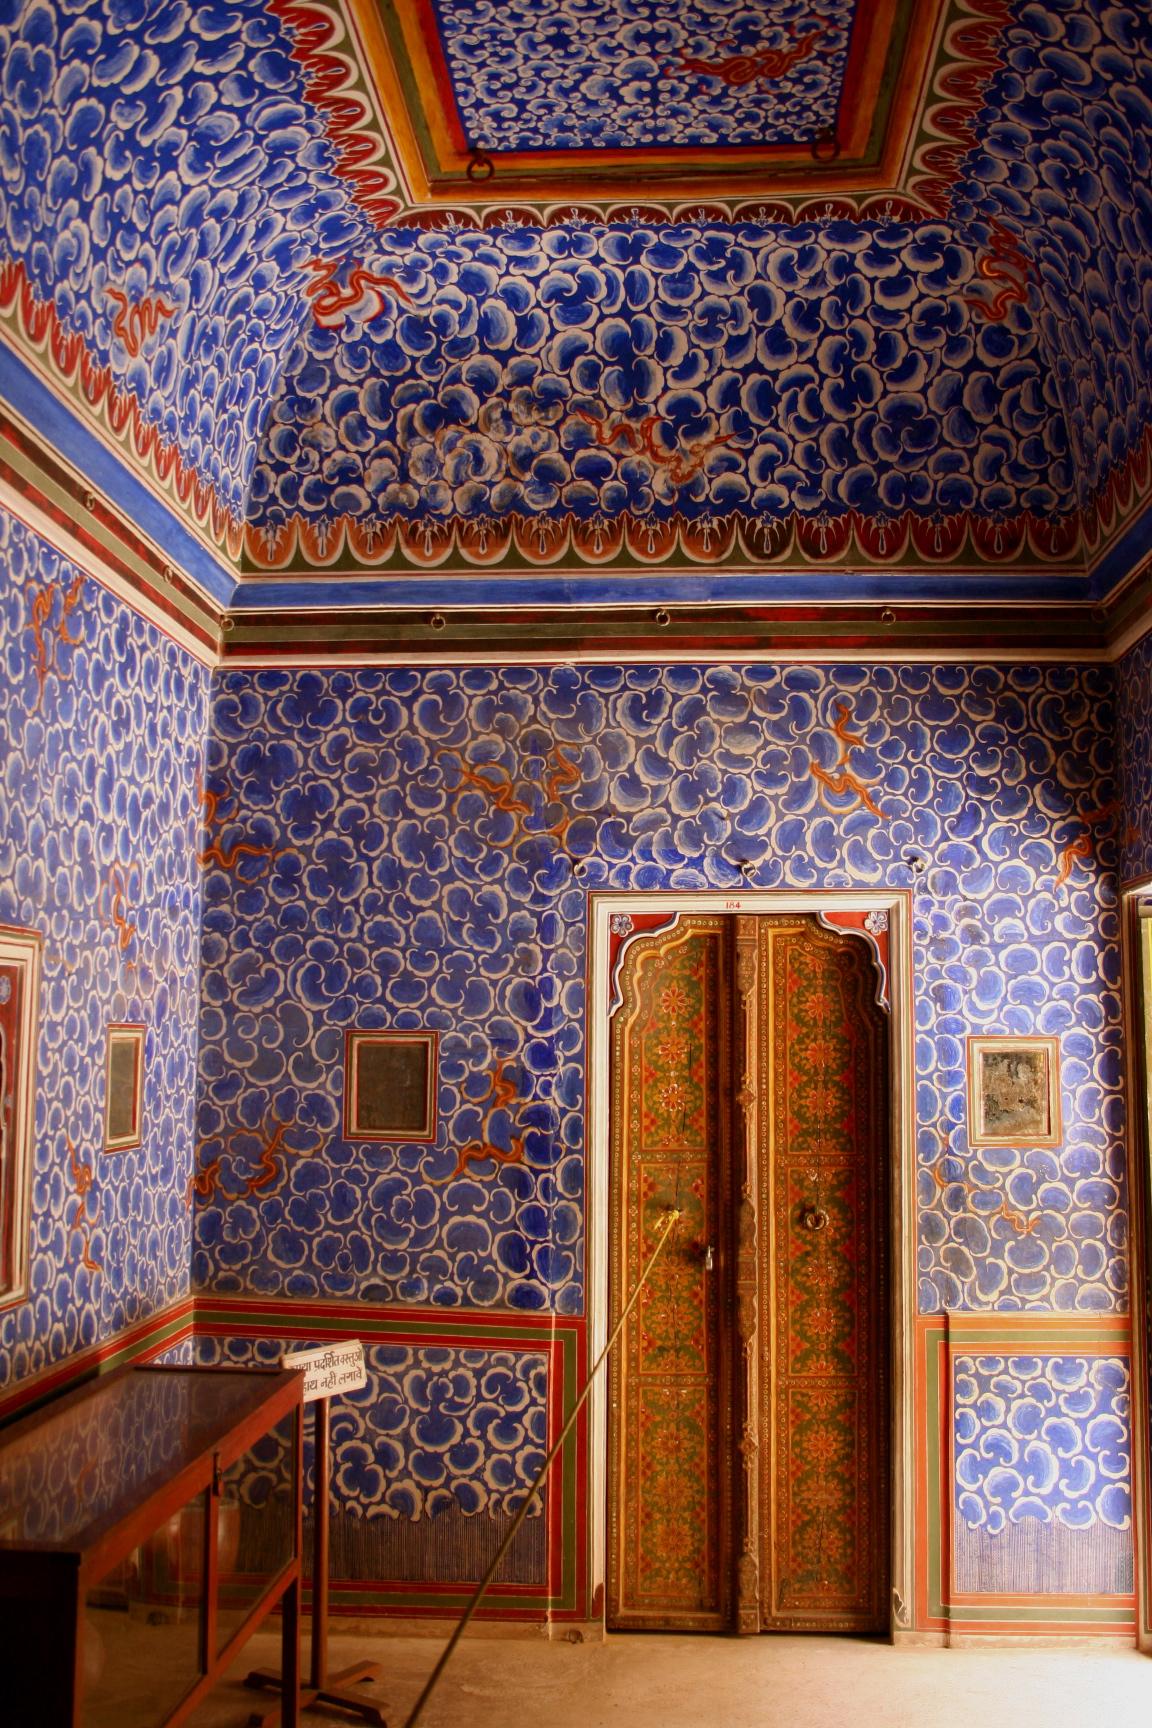 FileBadal Mahal Junagarh Fort Bikanerjpg Wikimedia